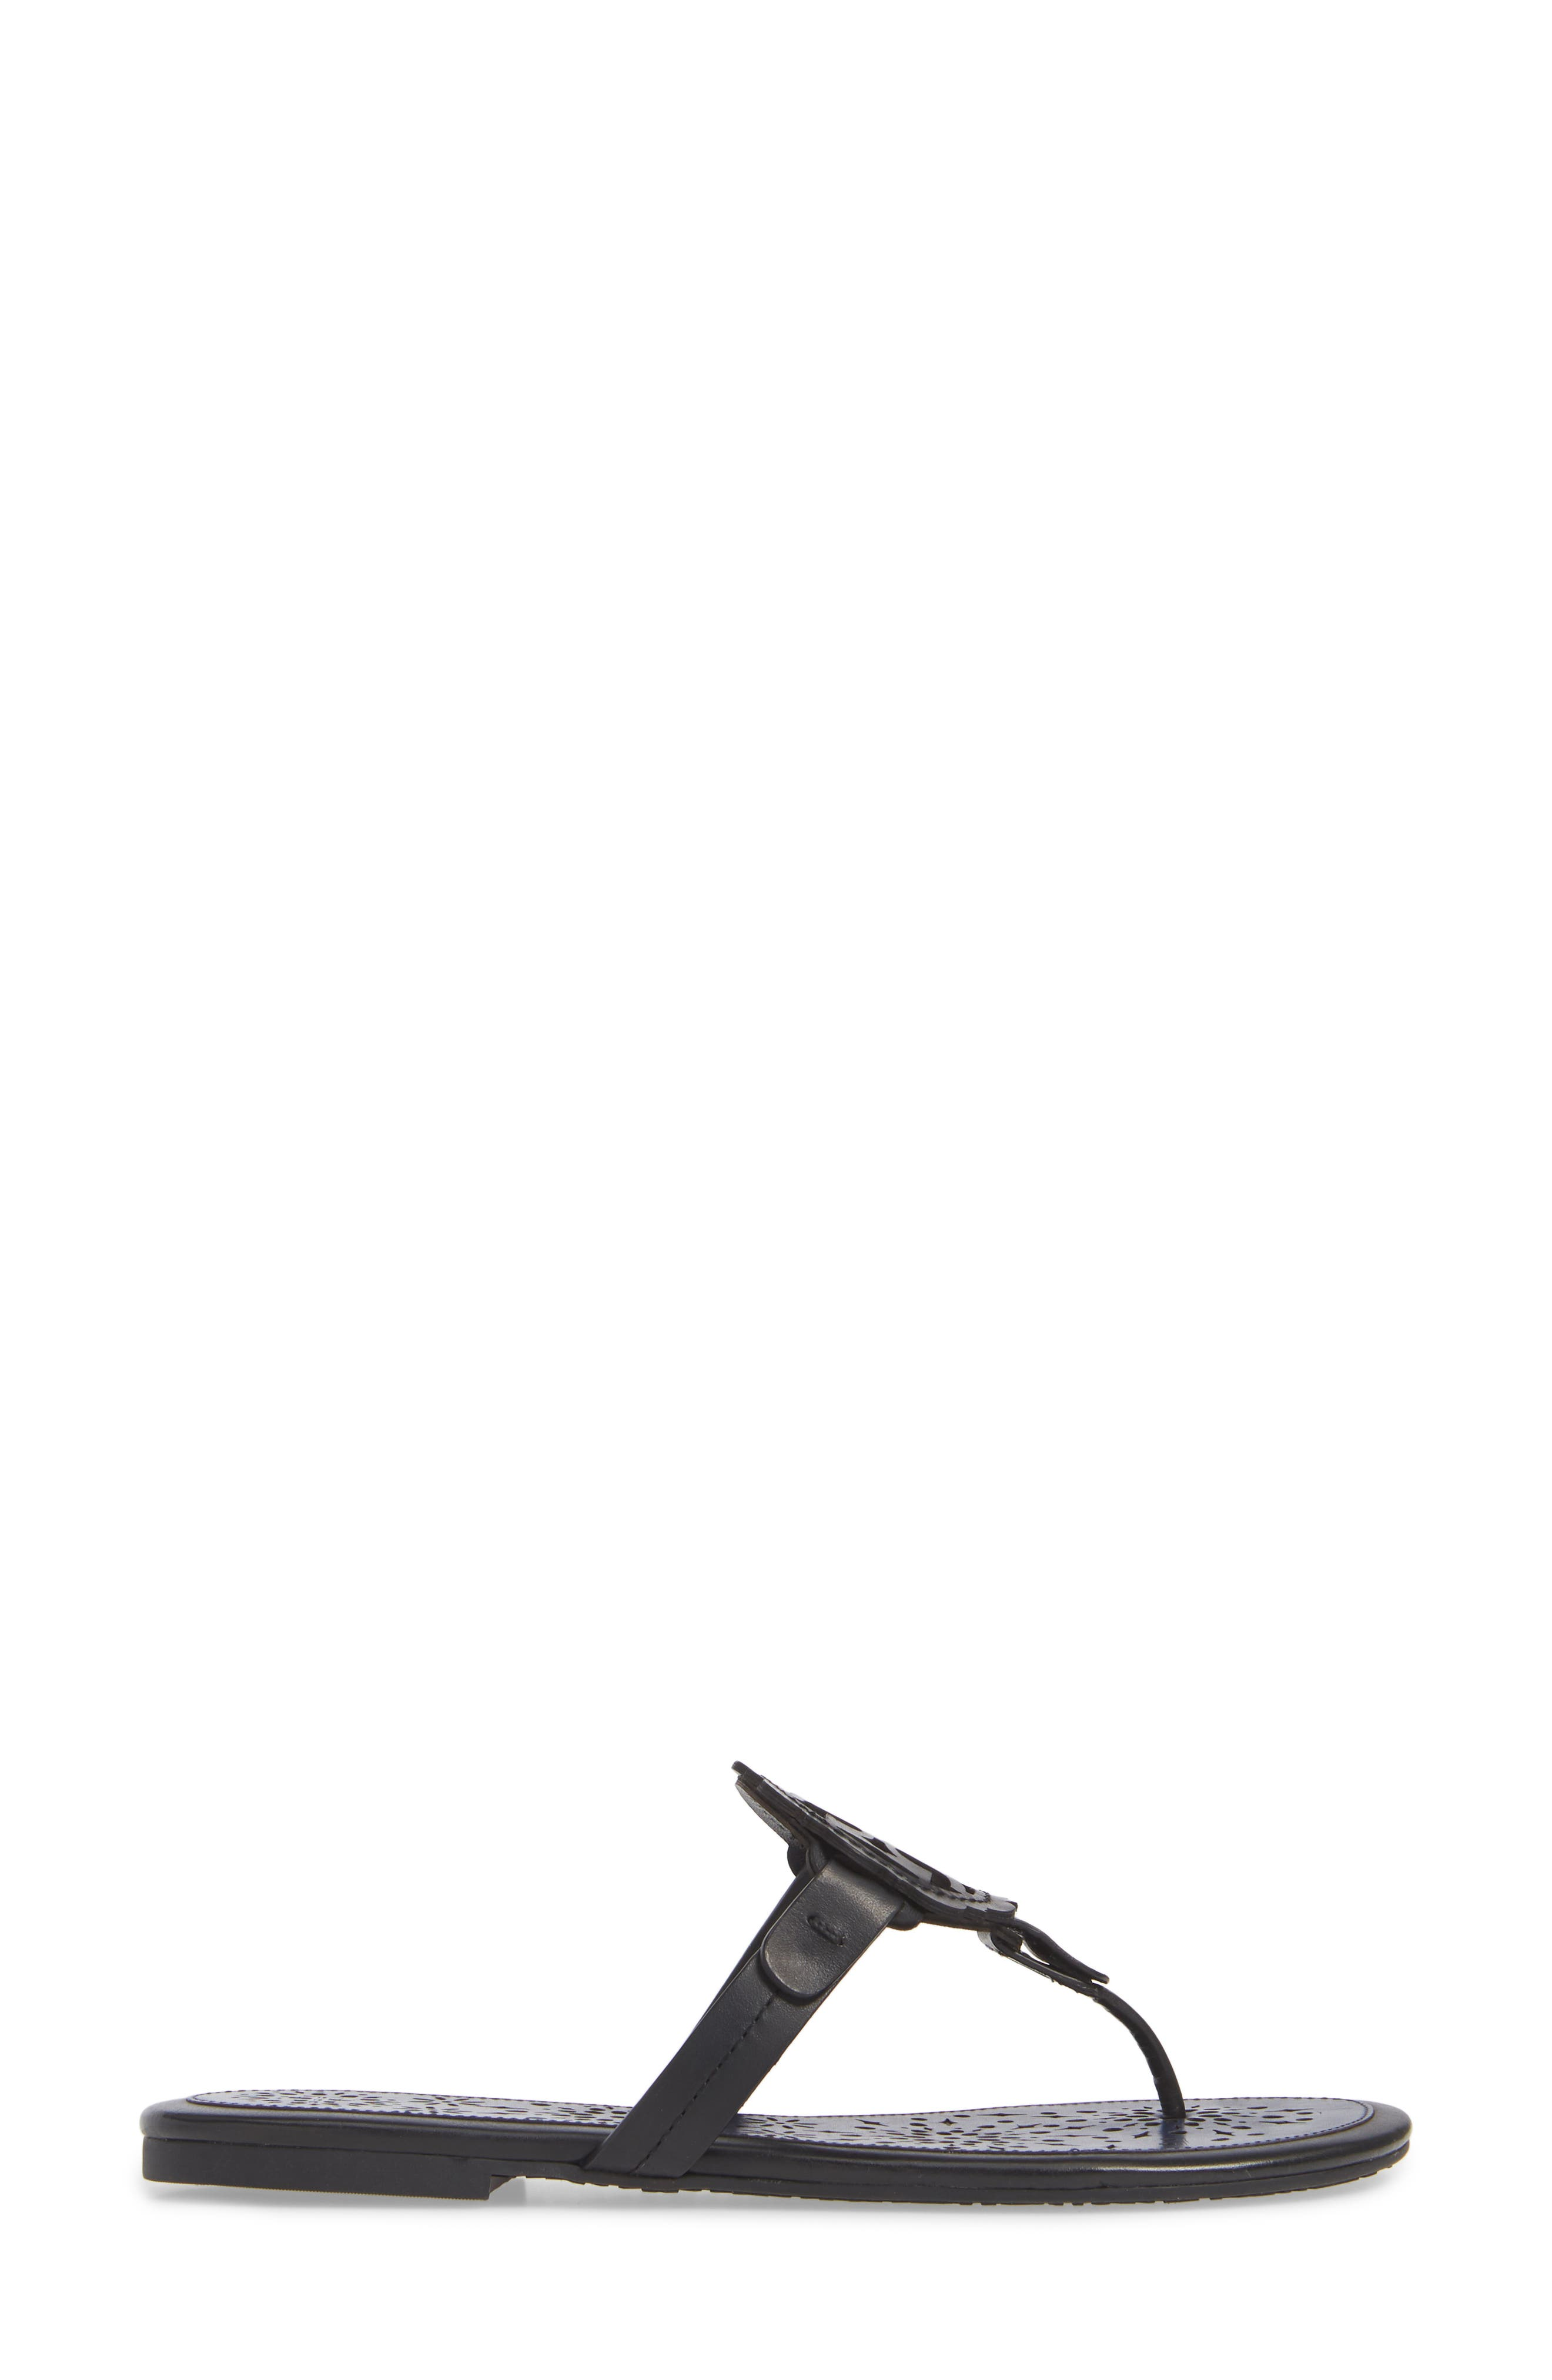 Miller Scalloped Medallion Sandal,                             Alternate thumbnail 3, color,                             PERFECT BLACK/ PERFECT NAVY